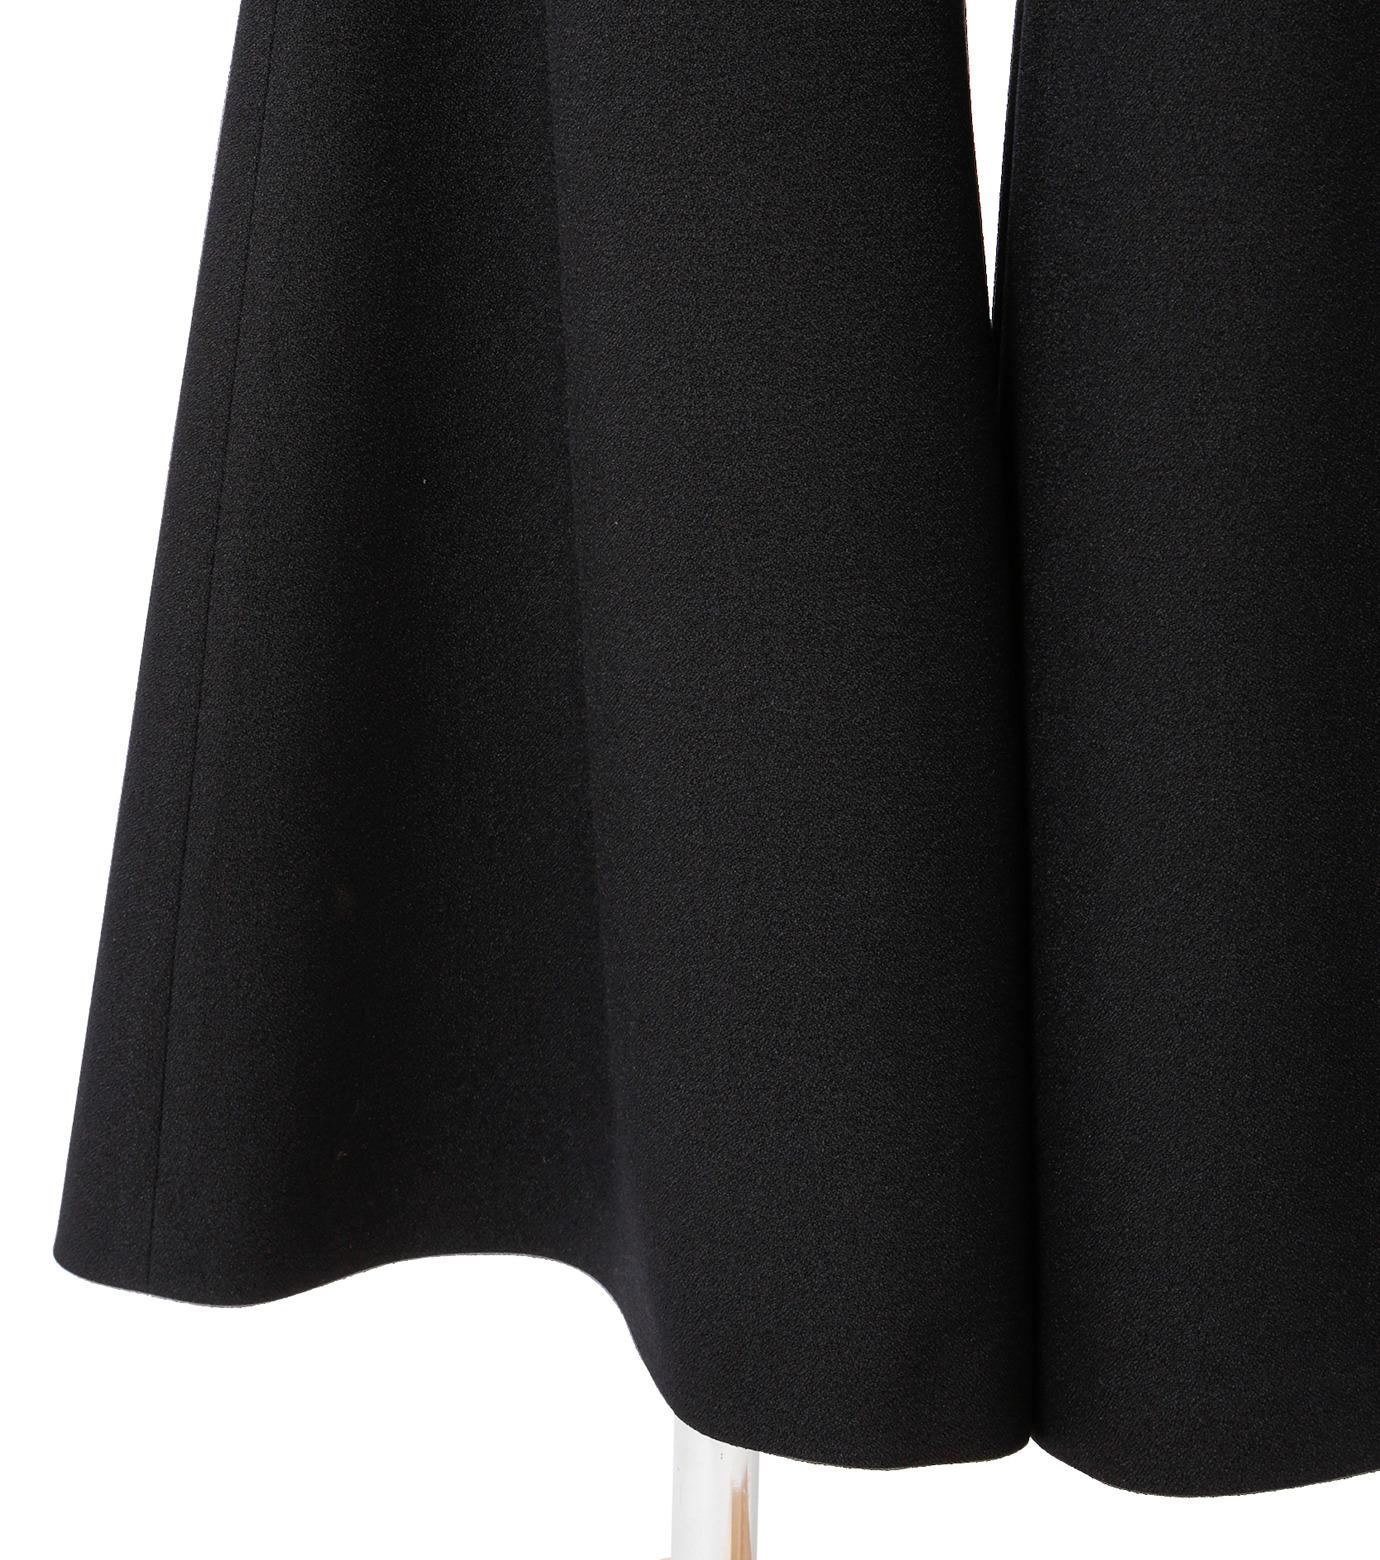 IRENE(アイレネ)のトランペットトラウザー-BLACK(パンツ/pants)-18A88002 拡大詳細画像6